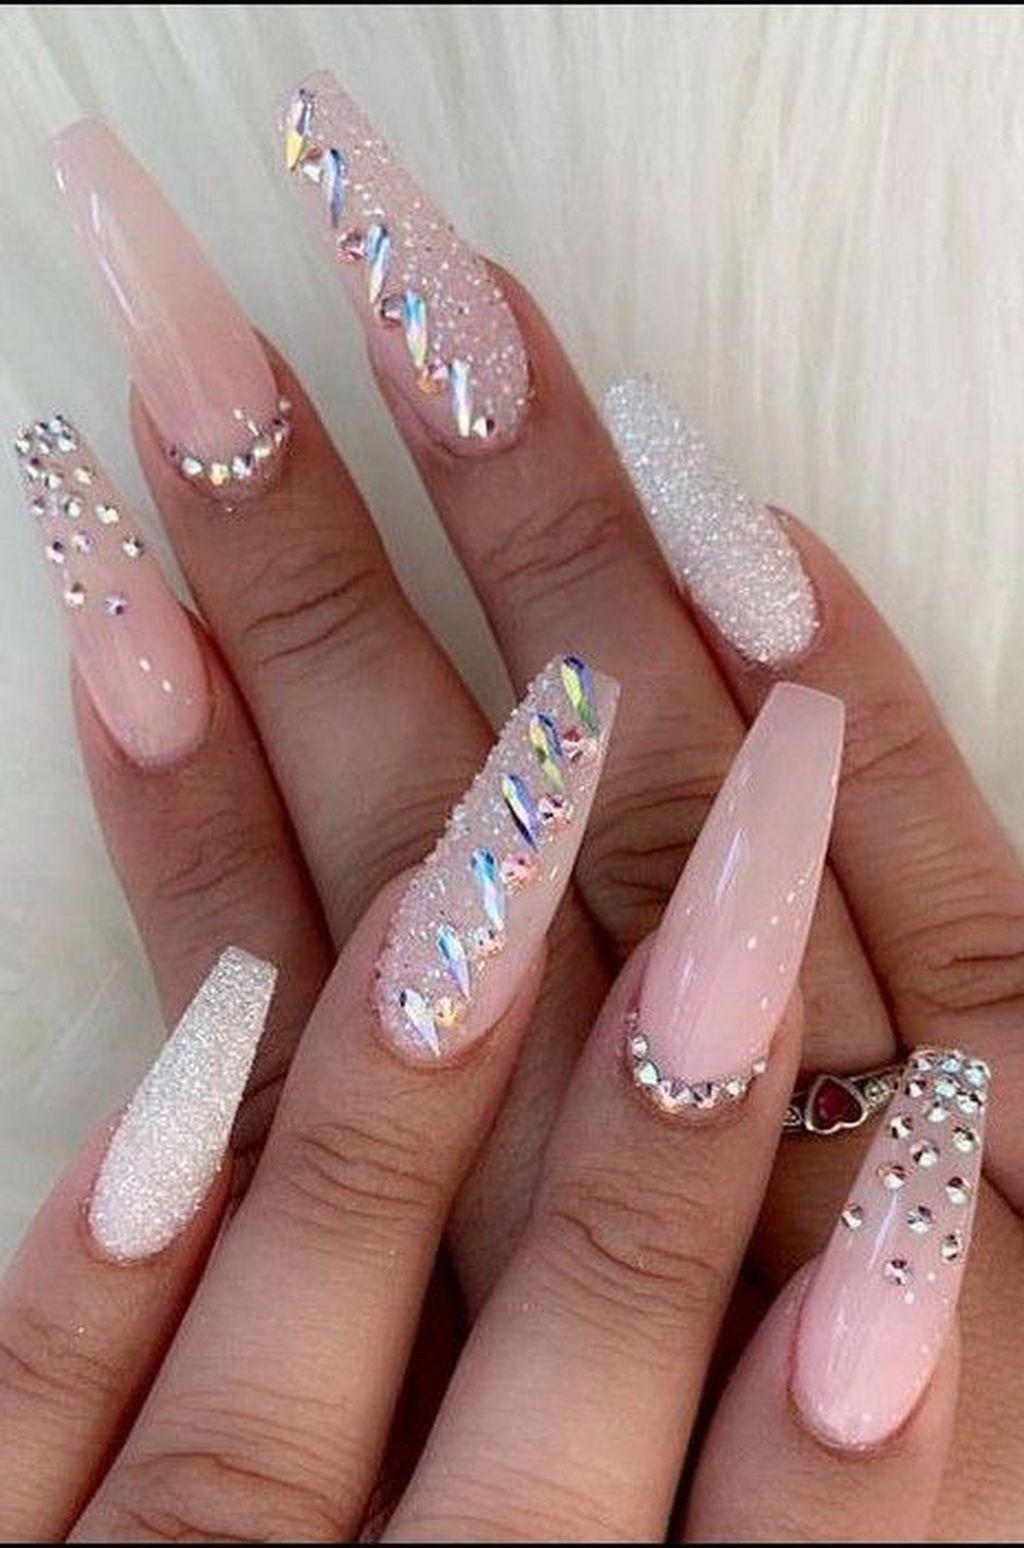 35 Unordinary Diamond Nail Design Ideas You Will Love It Birthdaynails Diamond Nail Designs Nails Design With Rhinestones Coffin Nails Designs